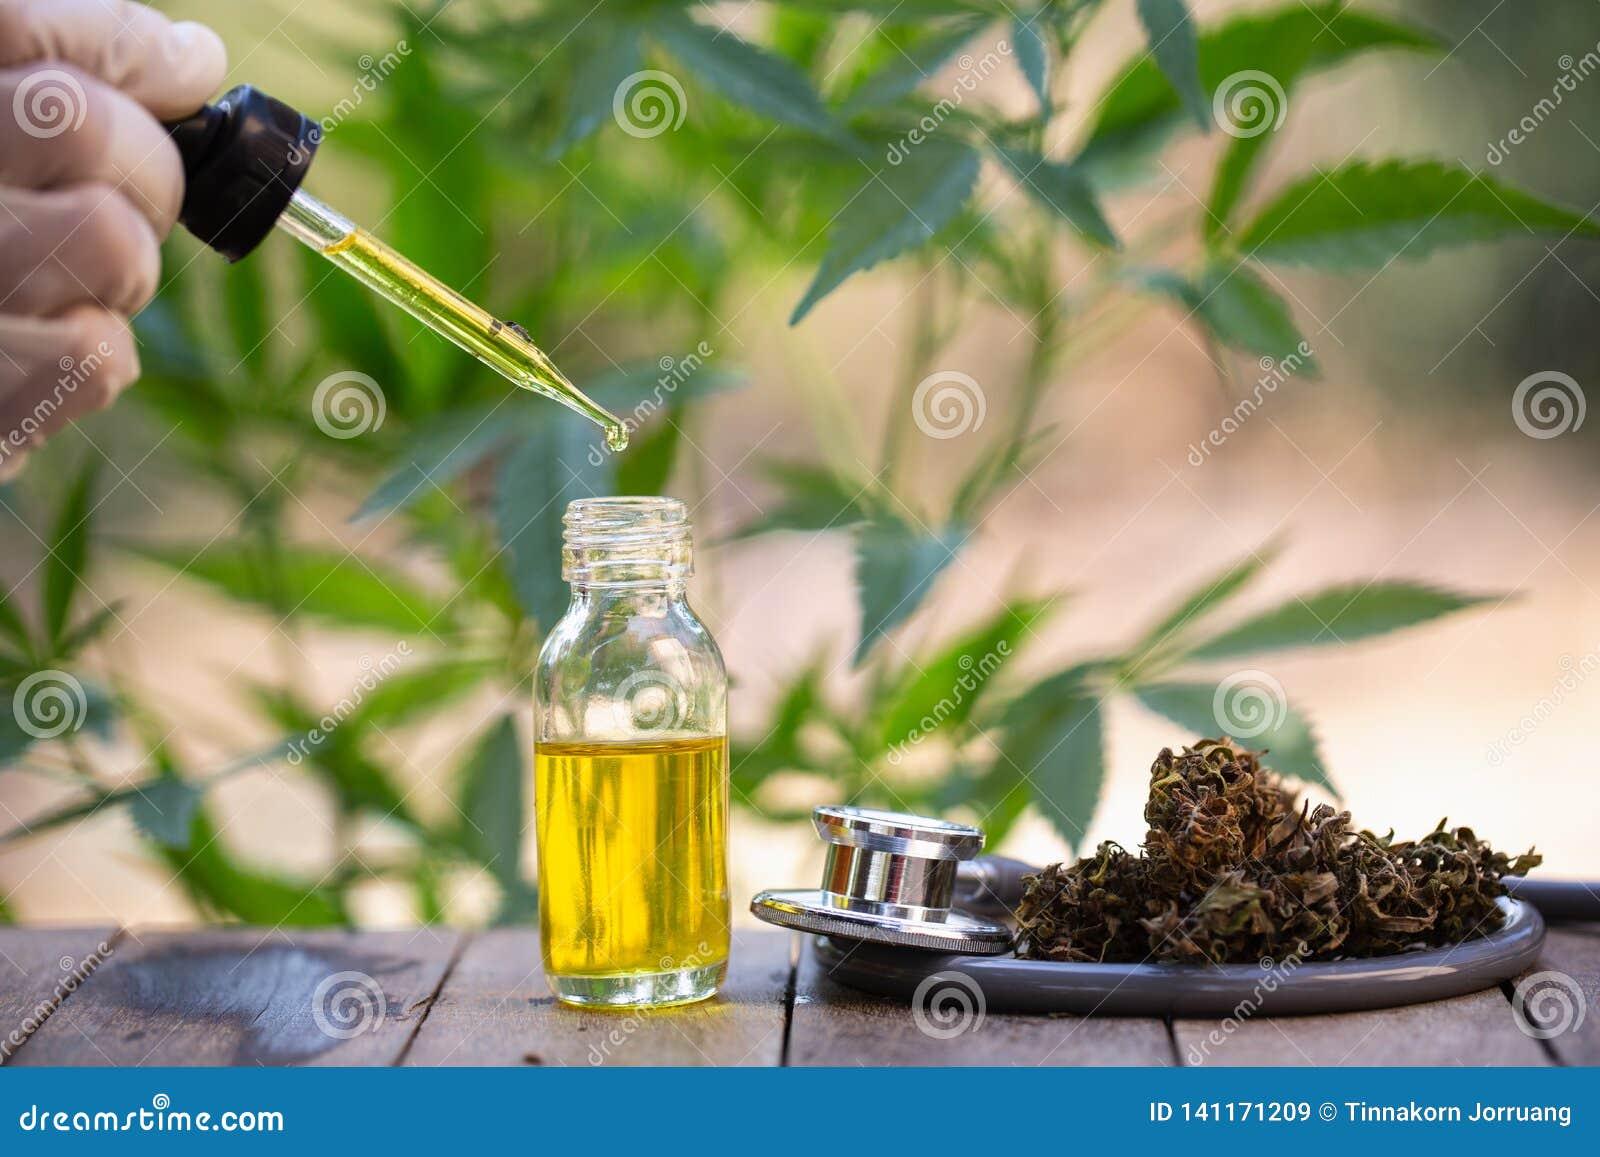 Hemp oil, Medical marijuana products including cannabis leaf, dried bud, cbd and hash oil over black wood background